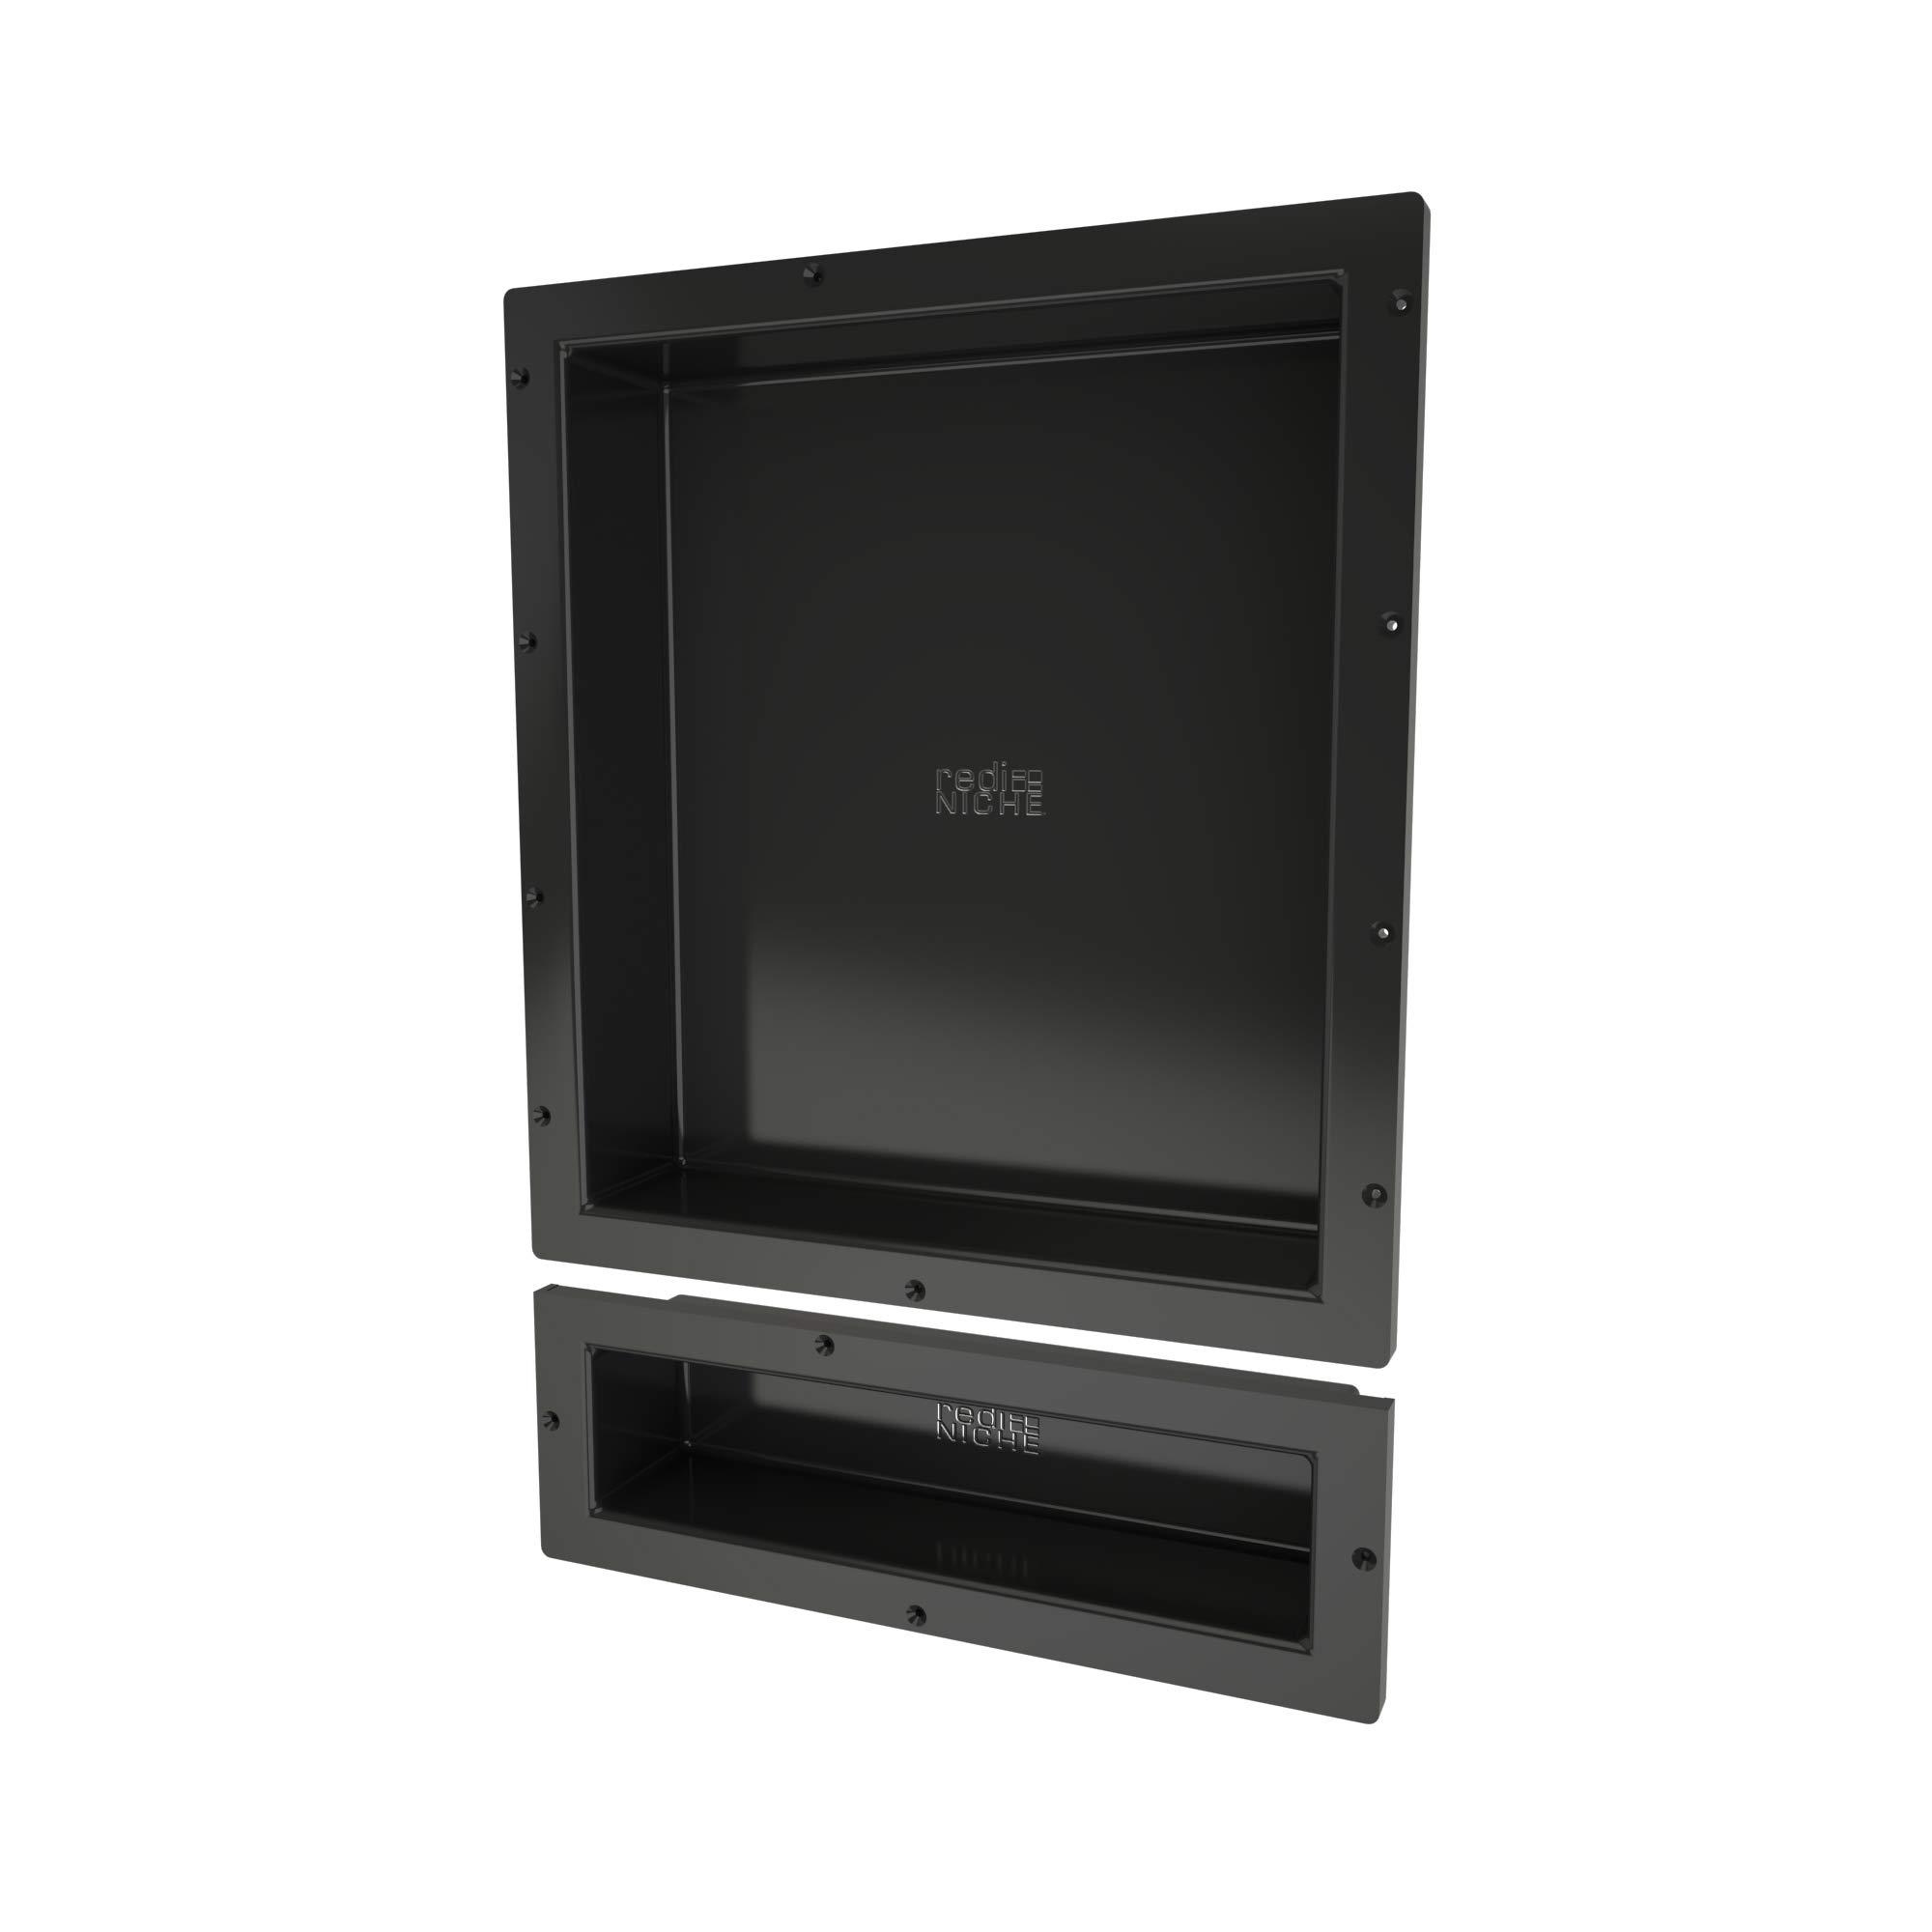 Redi Niche Double Recessed Shower Shelf – Black, Two Shelves, 16-Inch x 26-Inch x 4-Inch